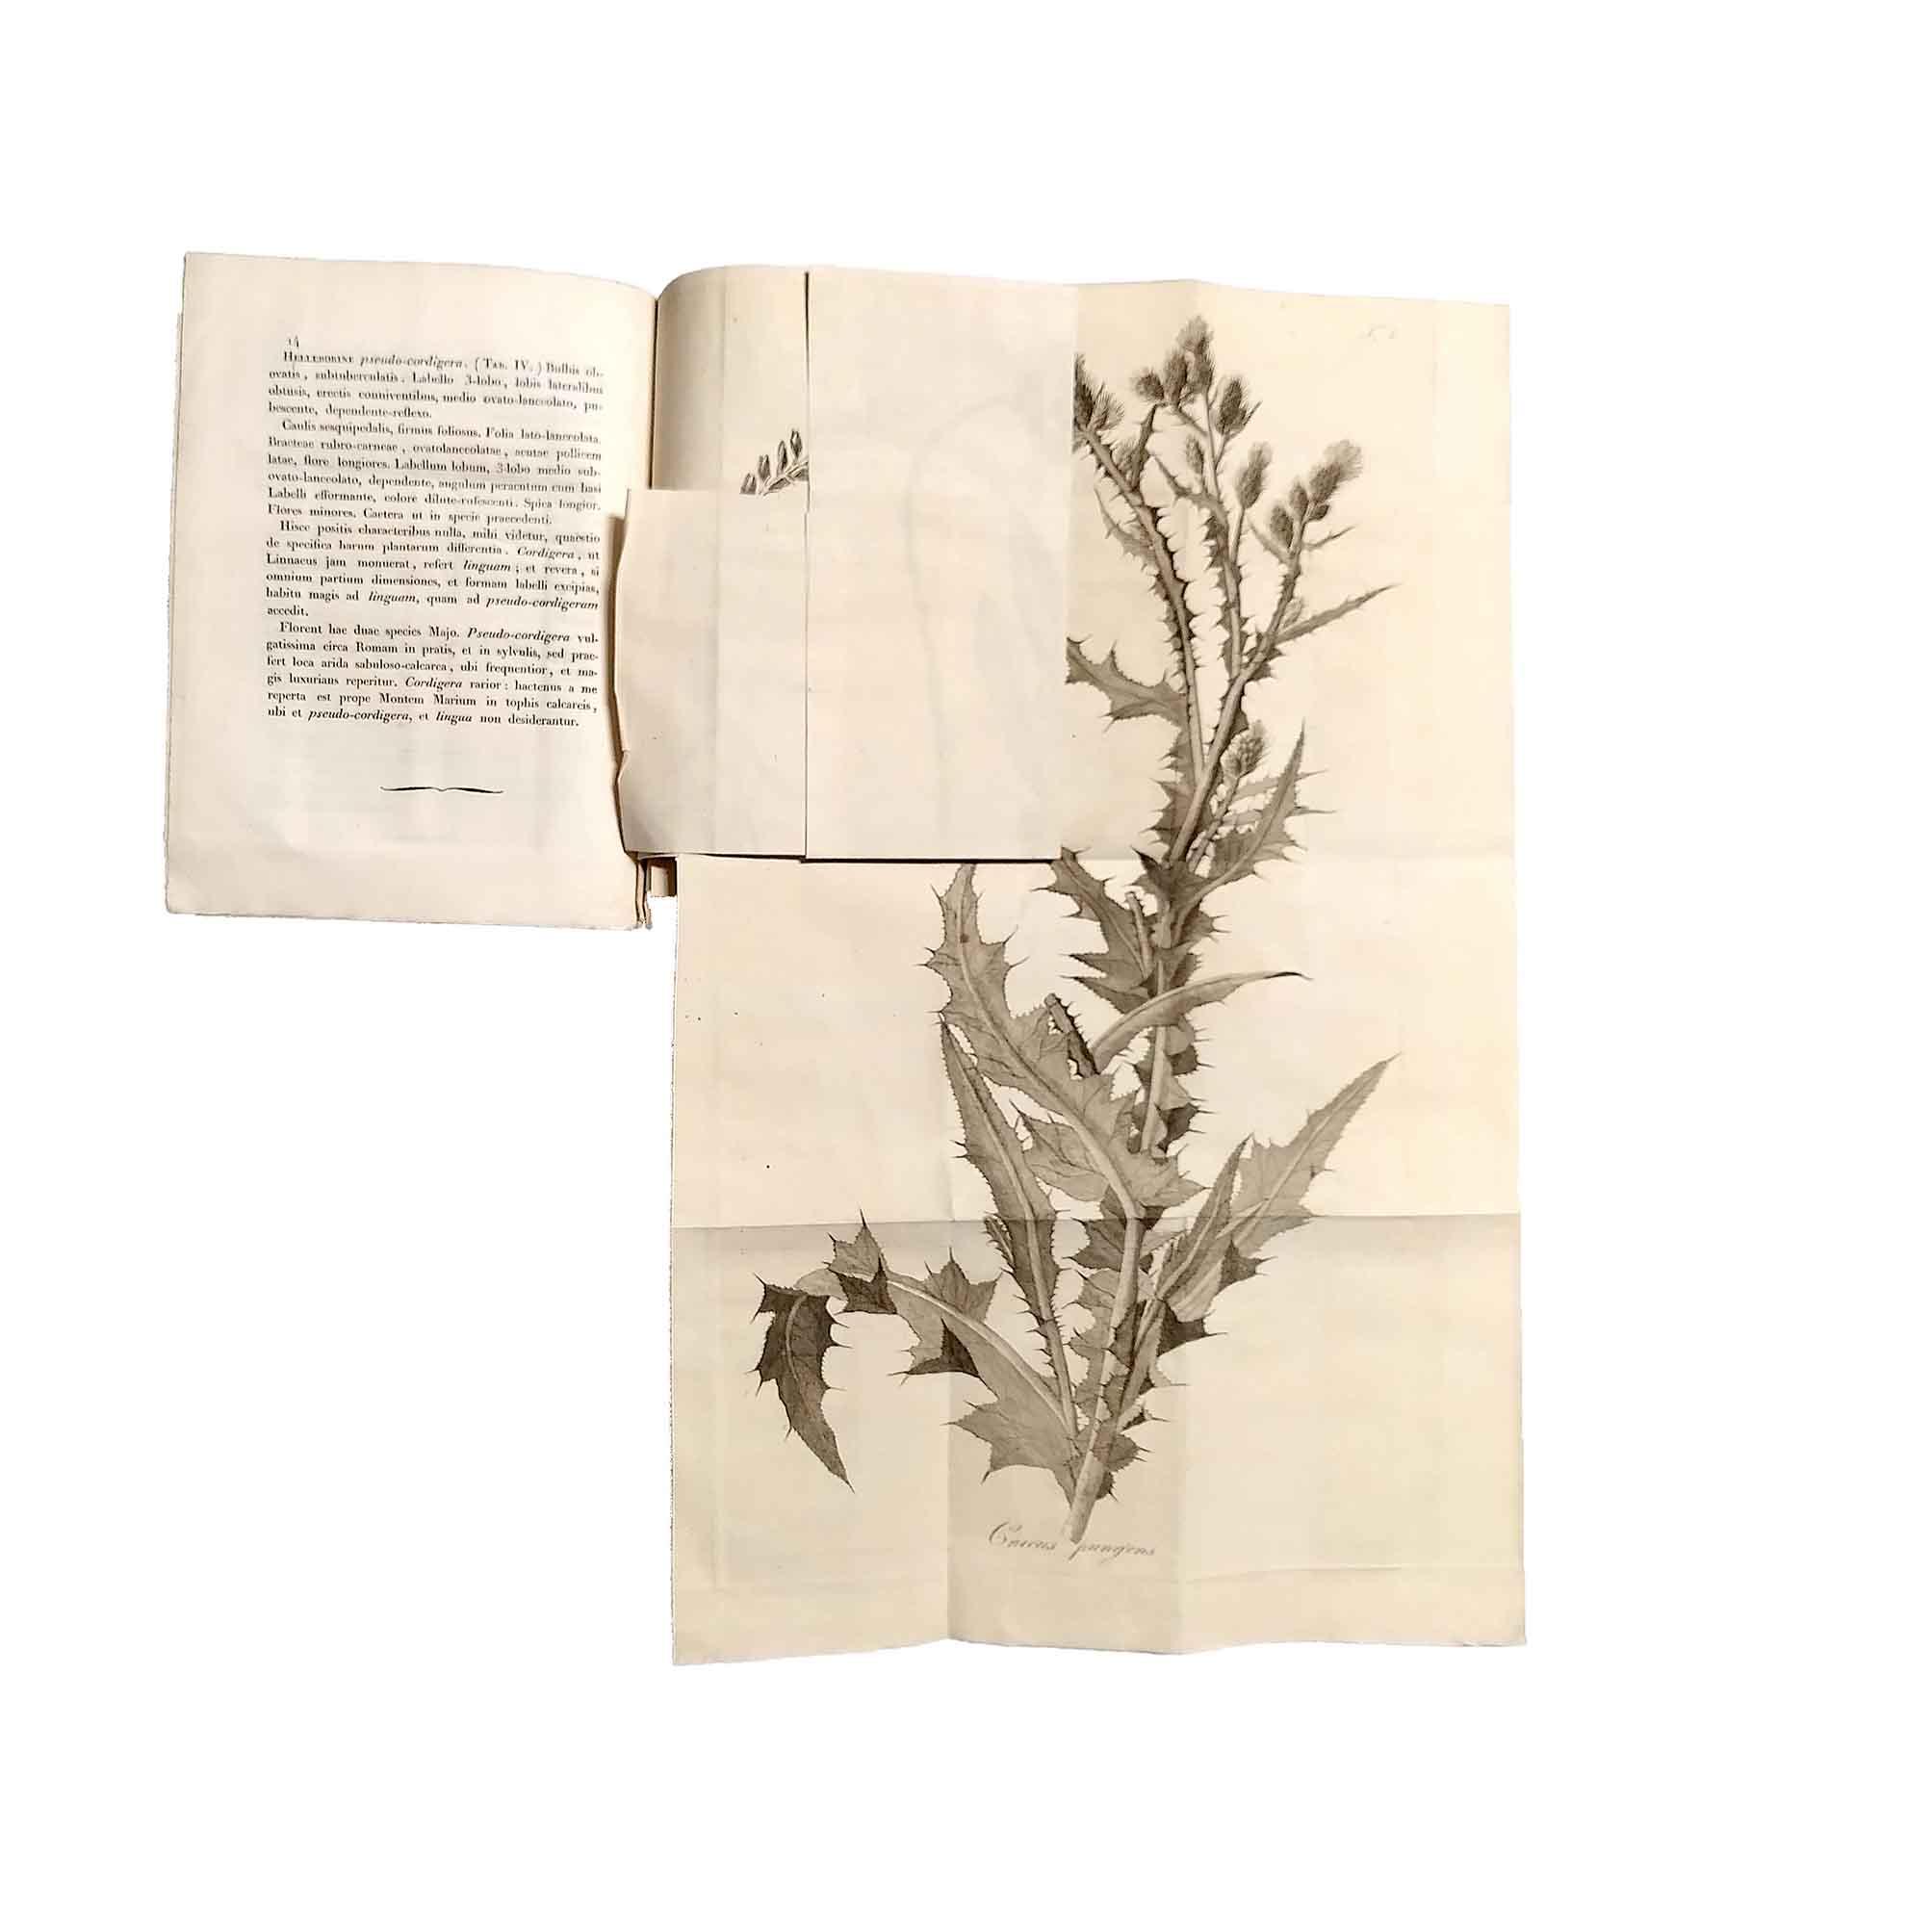 5971-Sebastiani-Romanarum-Plantarum-1815-Titelblatt-Kolosseum-Illustration-1-frei-N.jpg